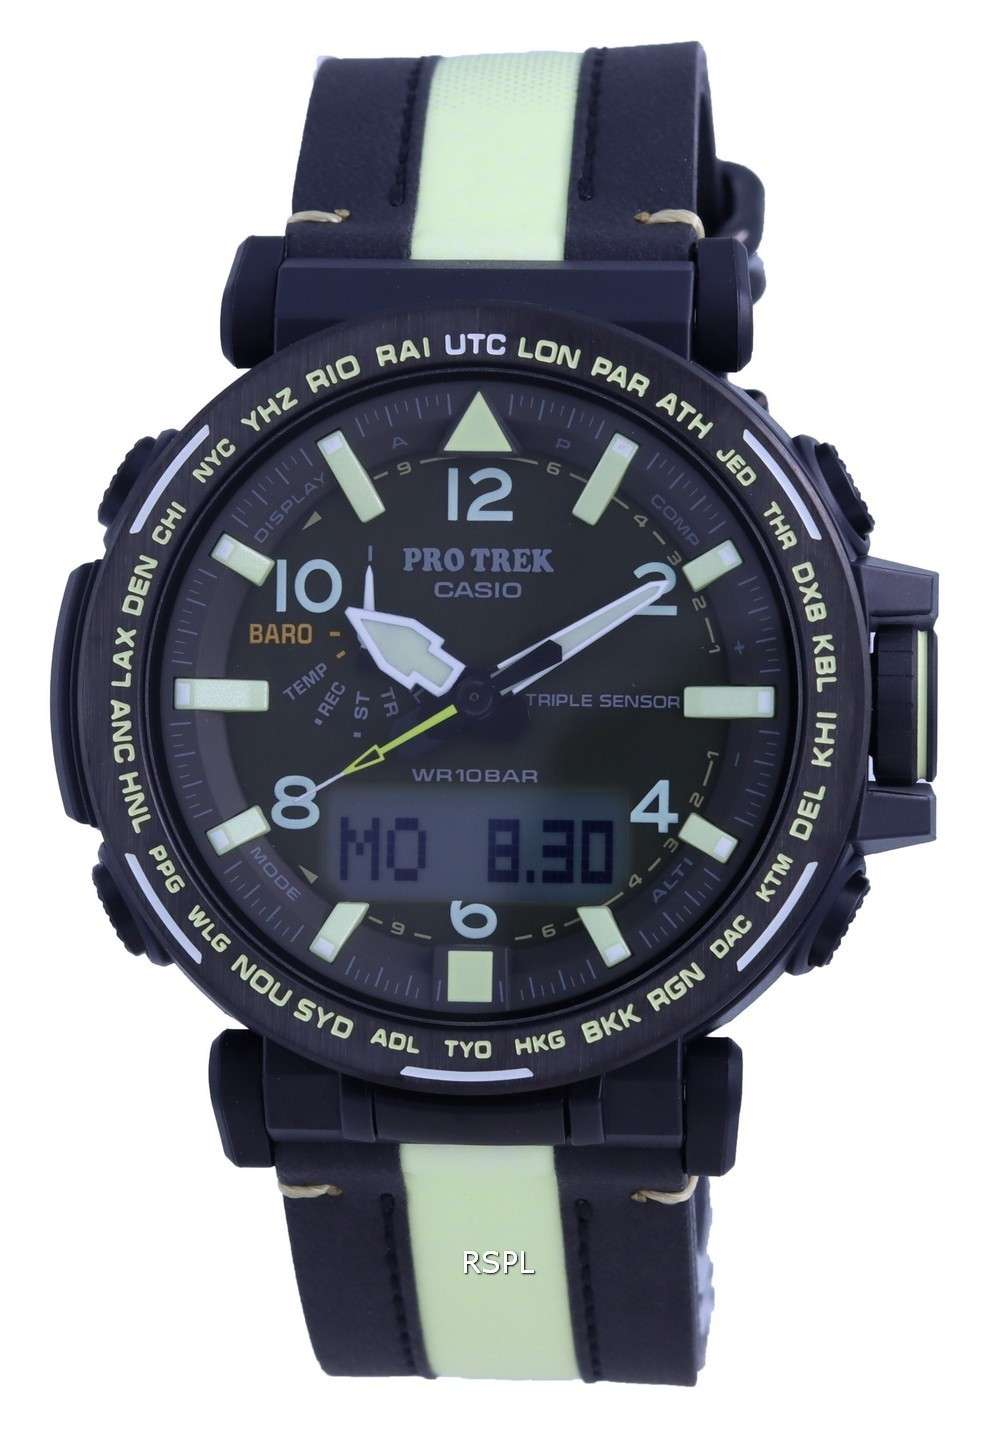 Reloj Casio Protrek Solar Analog Digital PRG-650YL-3 PRG650YL-3 100M para hombre